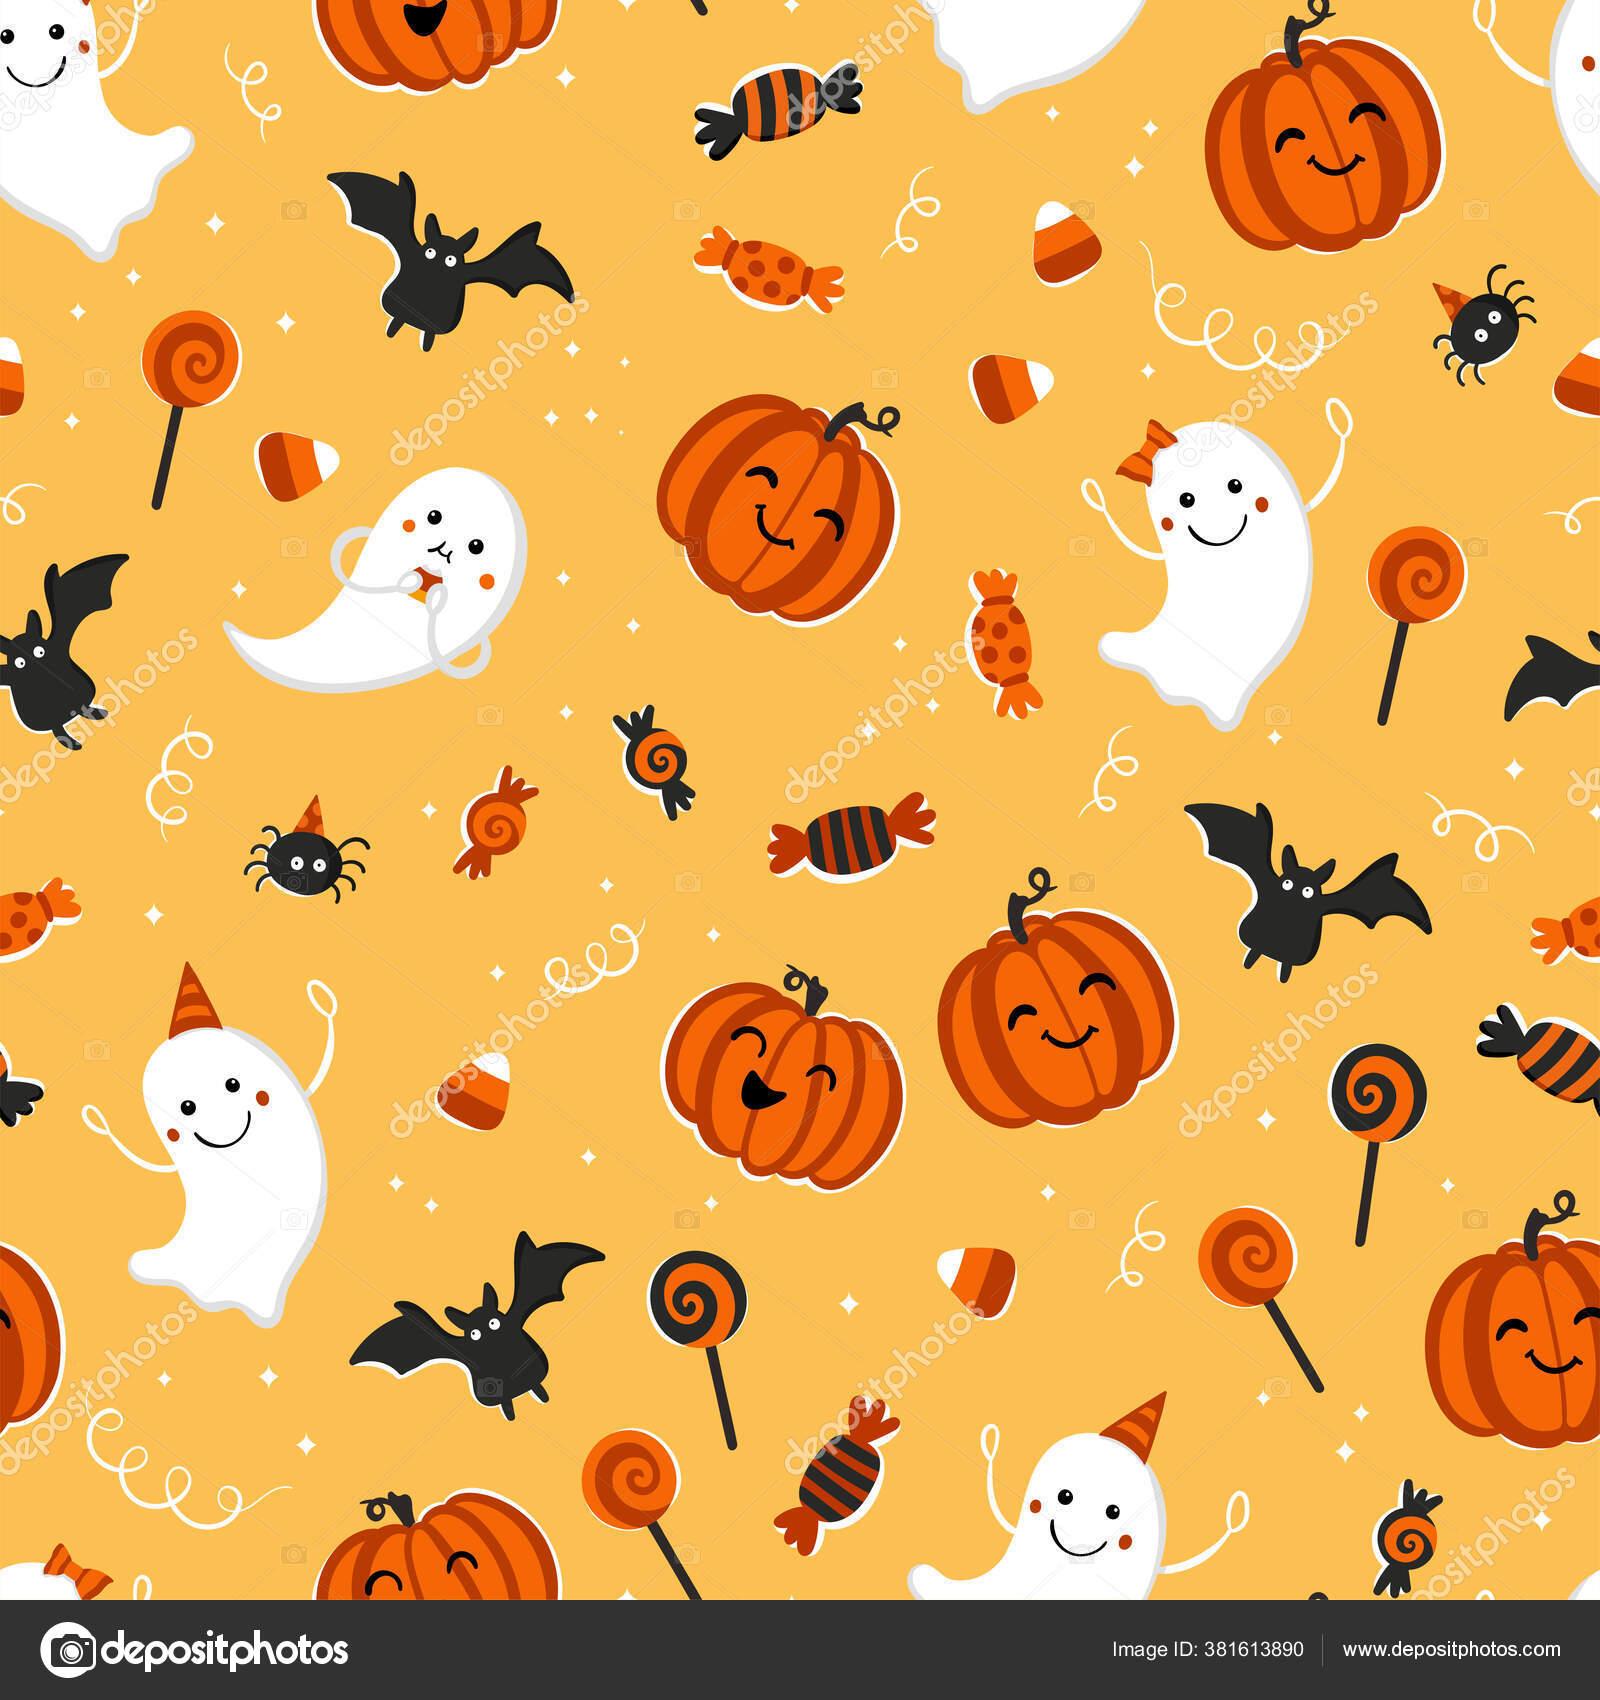 depositphotos 381613890 stock illustration fun hand drawn halloween seamless